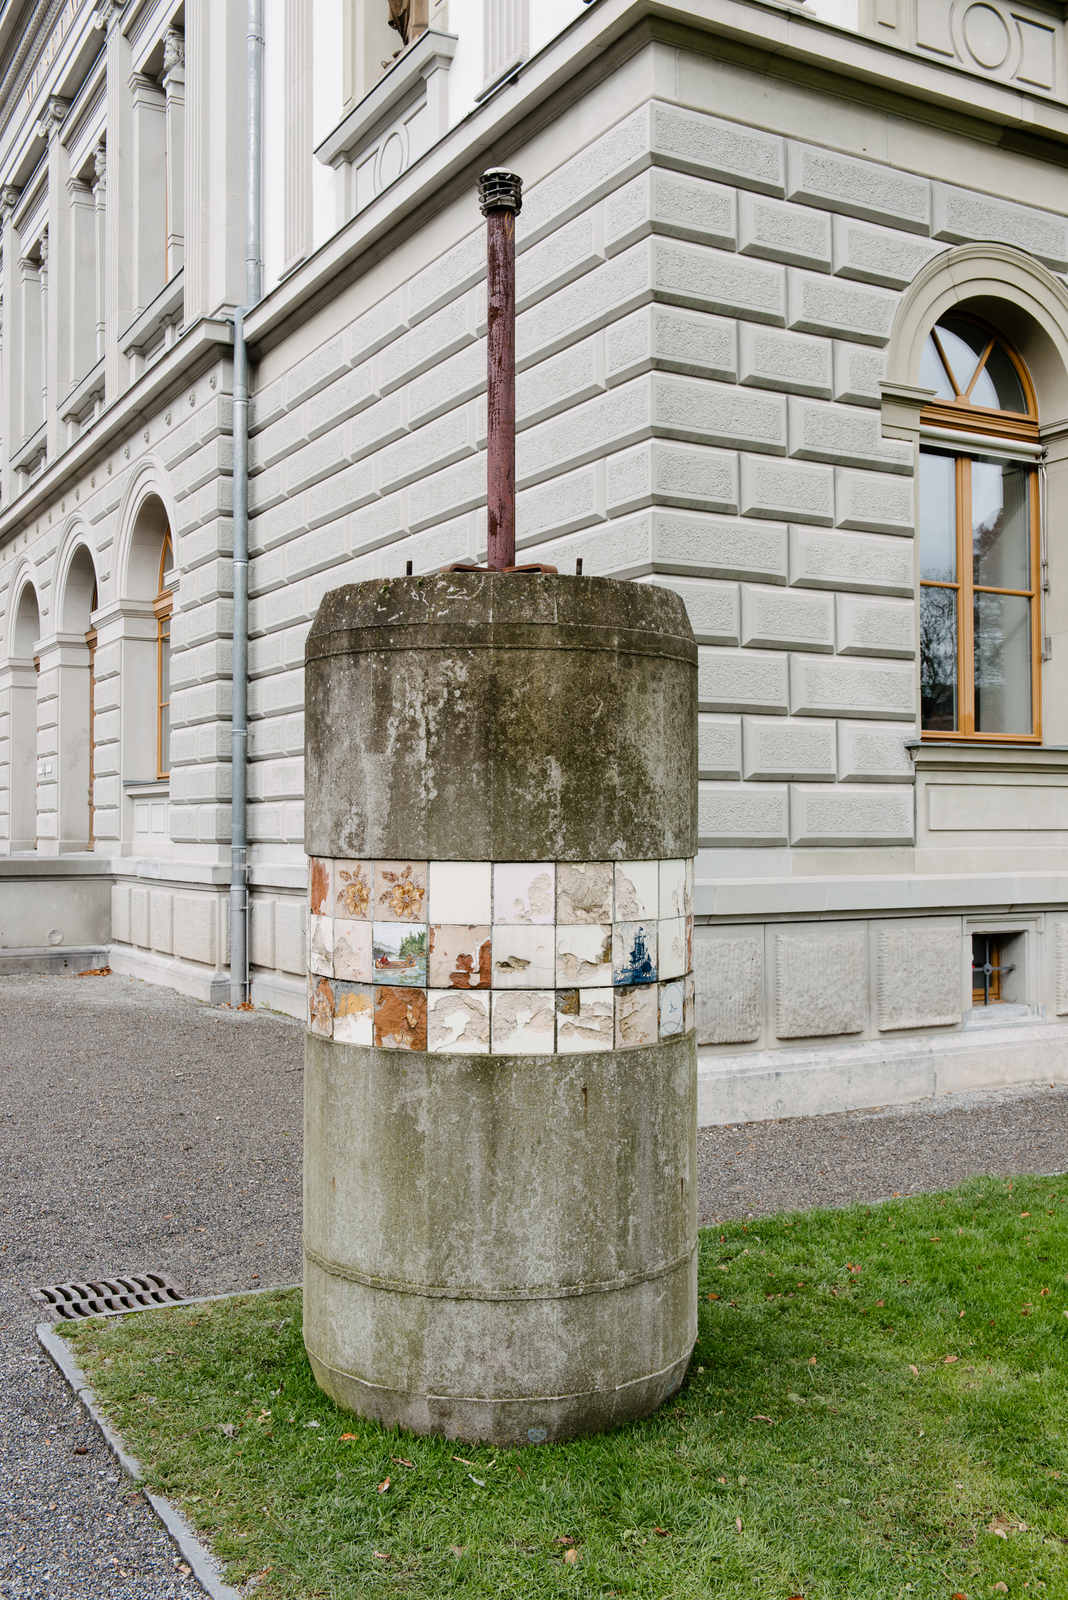 01_Installationsansicht_St.Gallen__Foto_Sebastian_Stadler